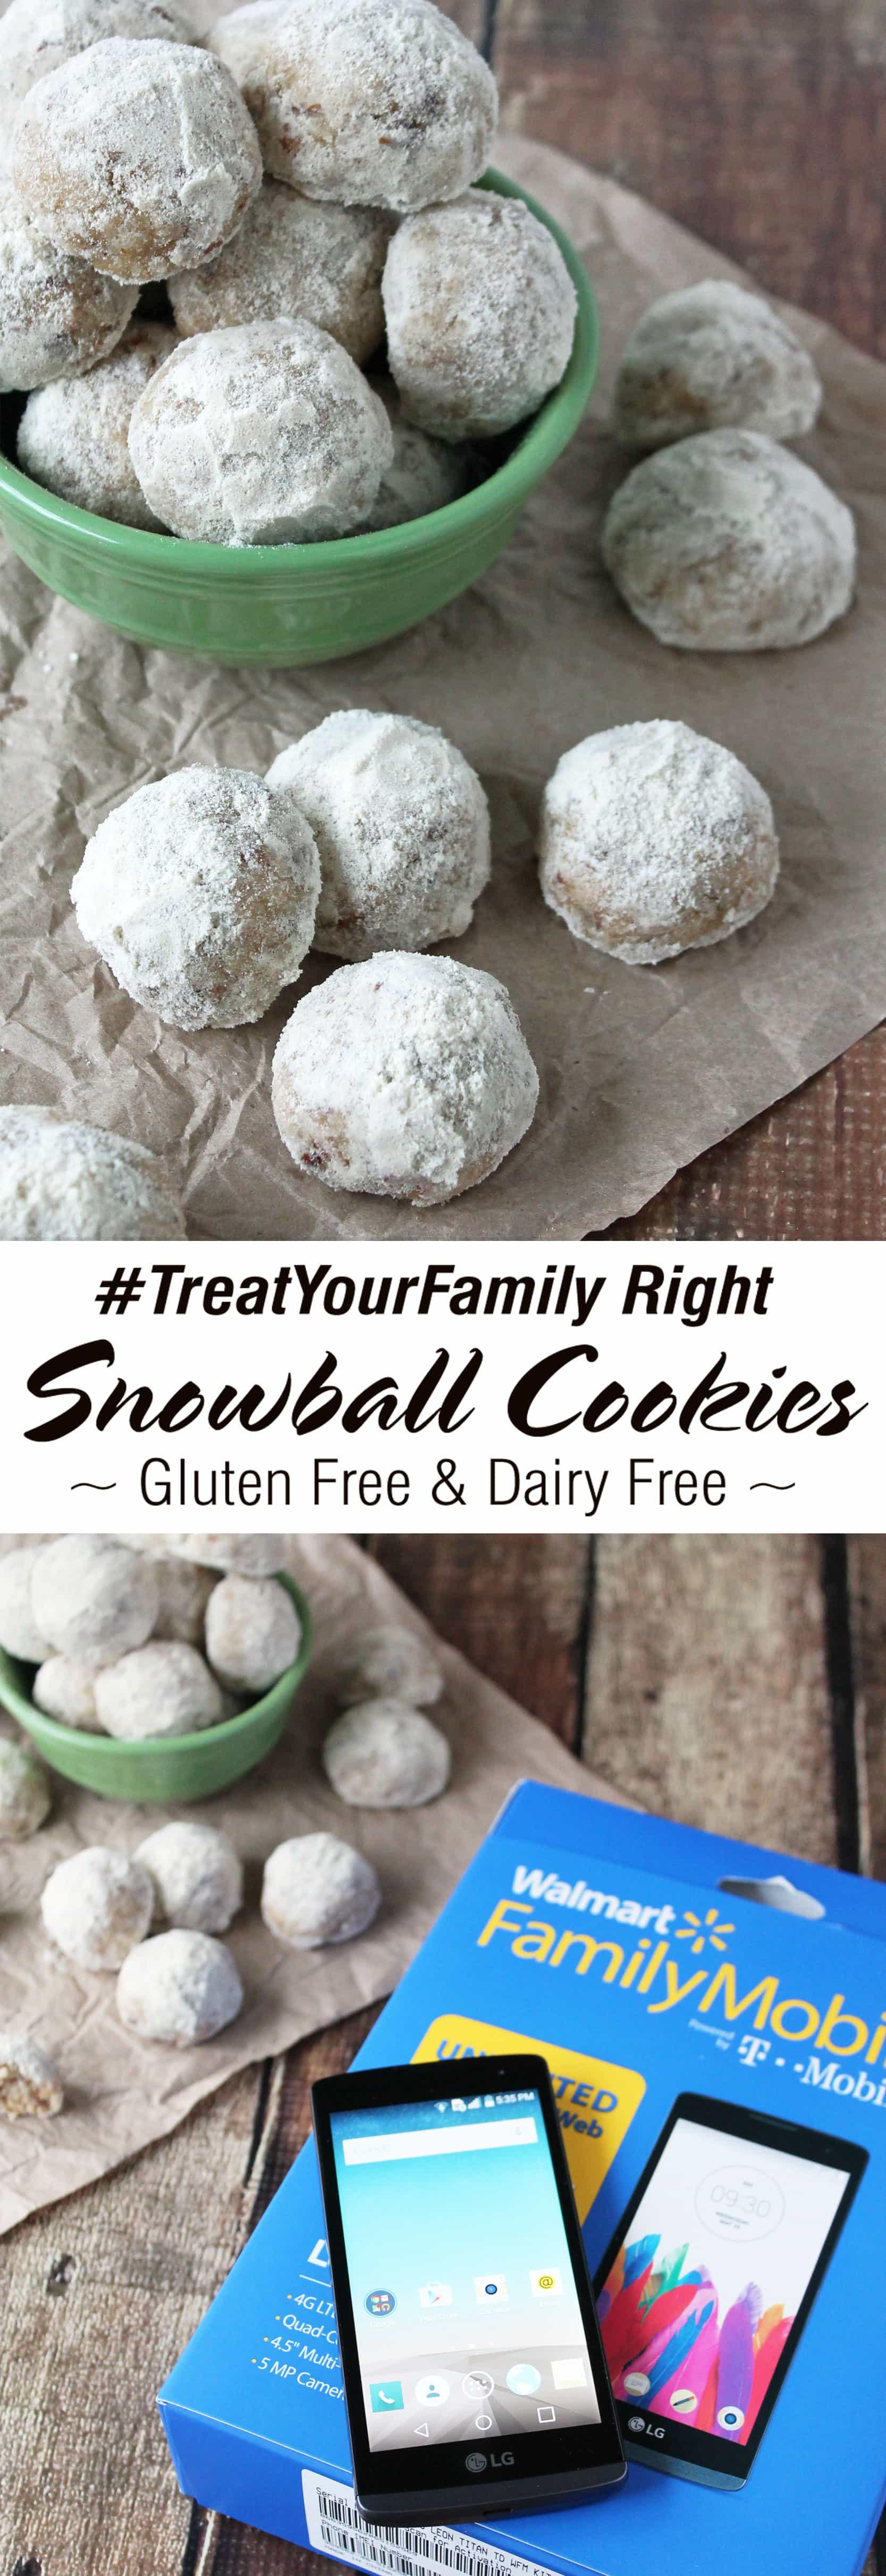 #TreatYourFamily-Right-Snowball-Cookies